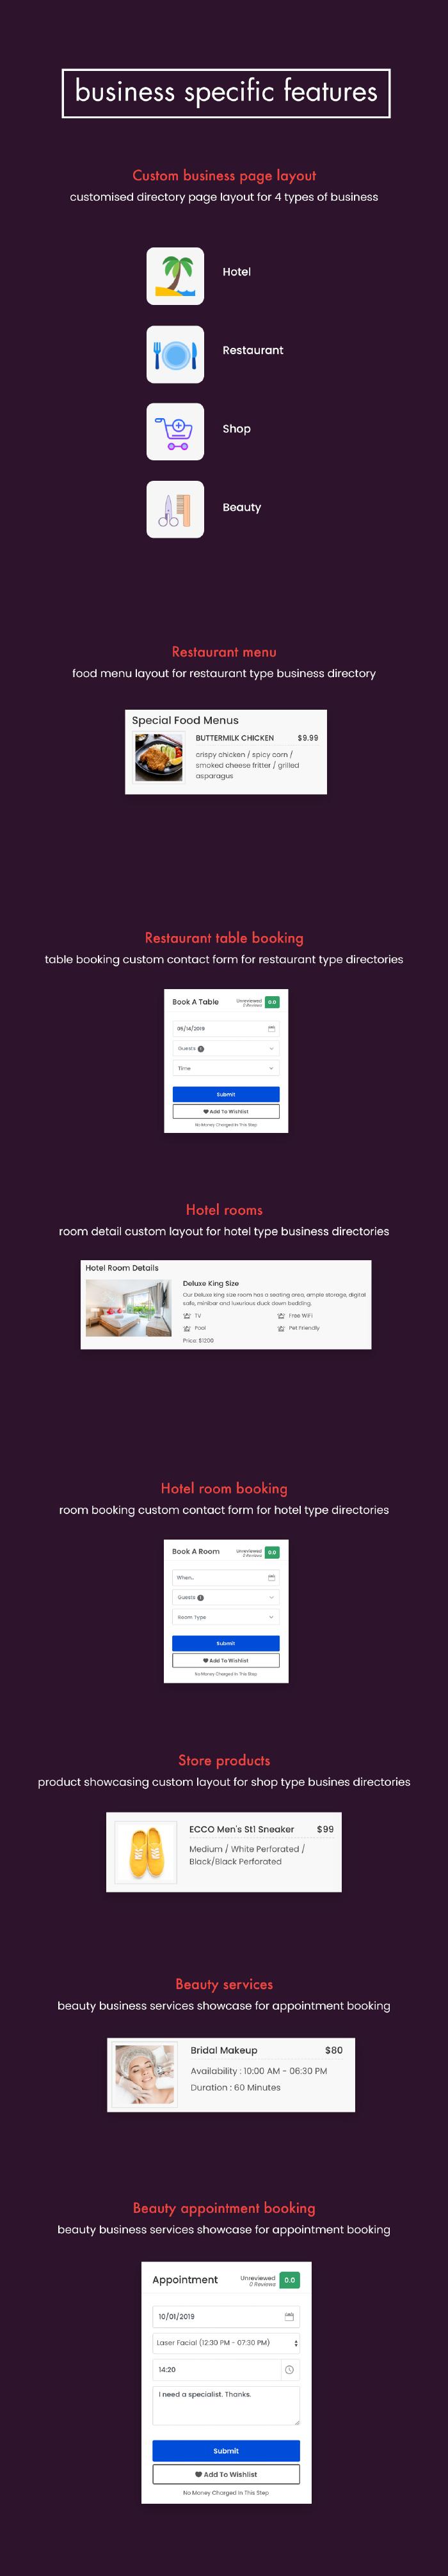 Atlas Business Directory Listing - 15